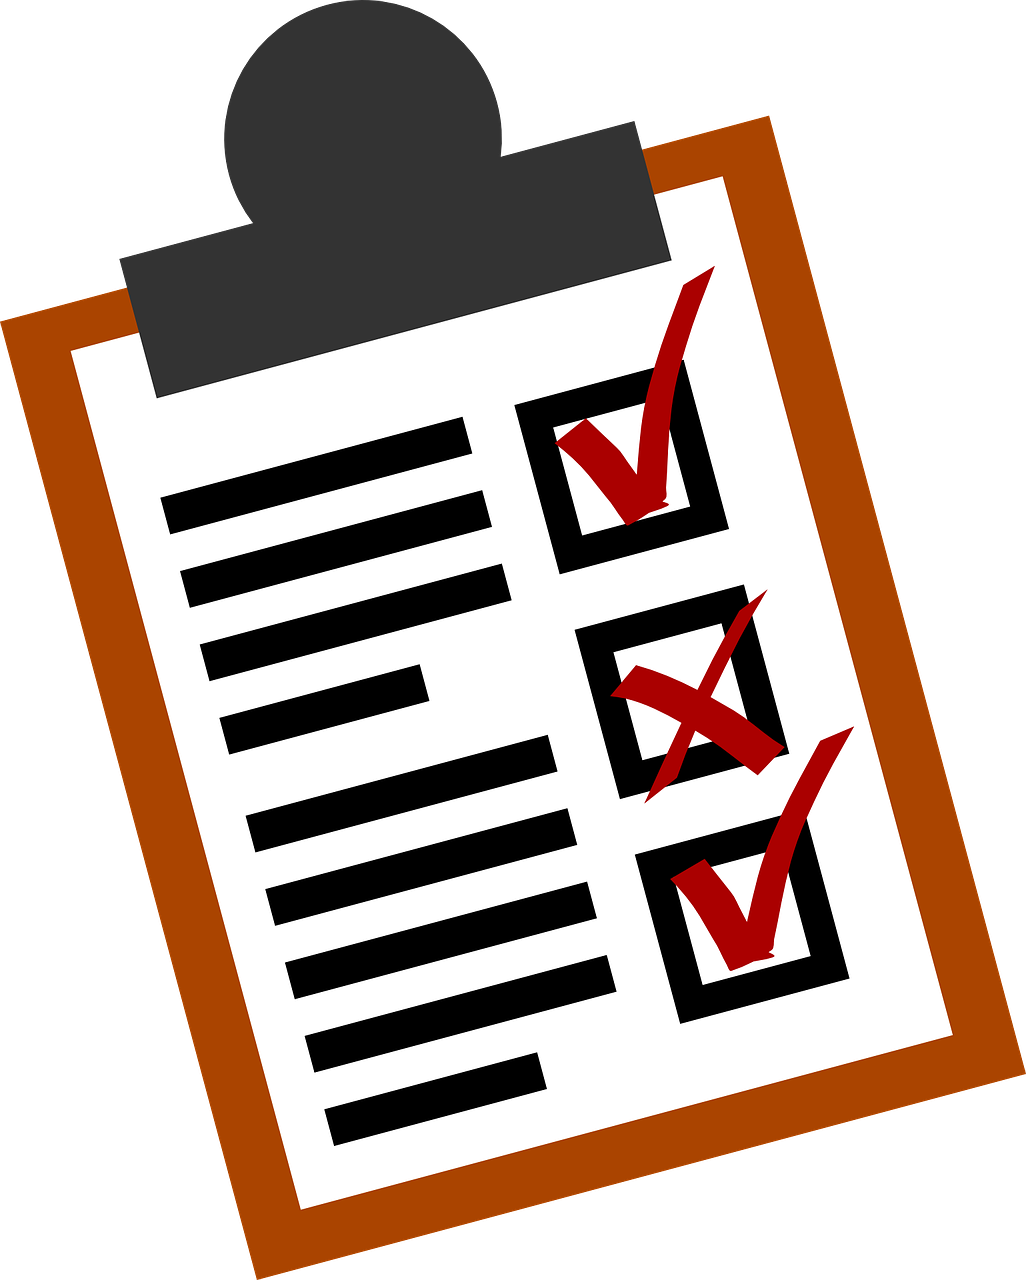 checklist-41335_1280.png